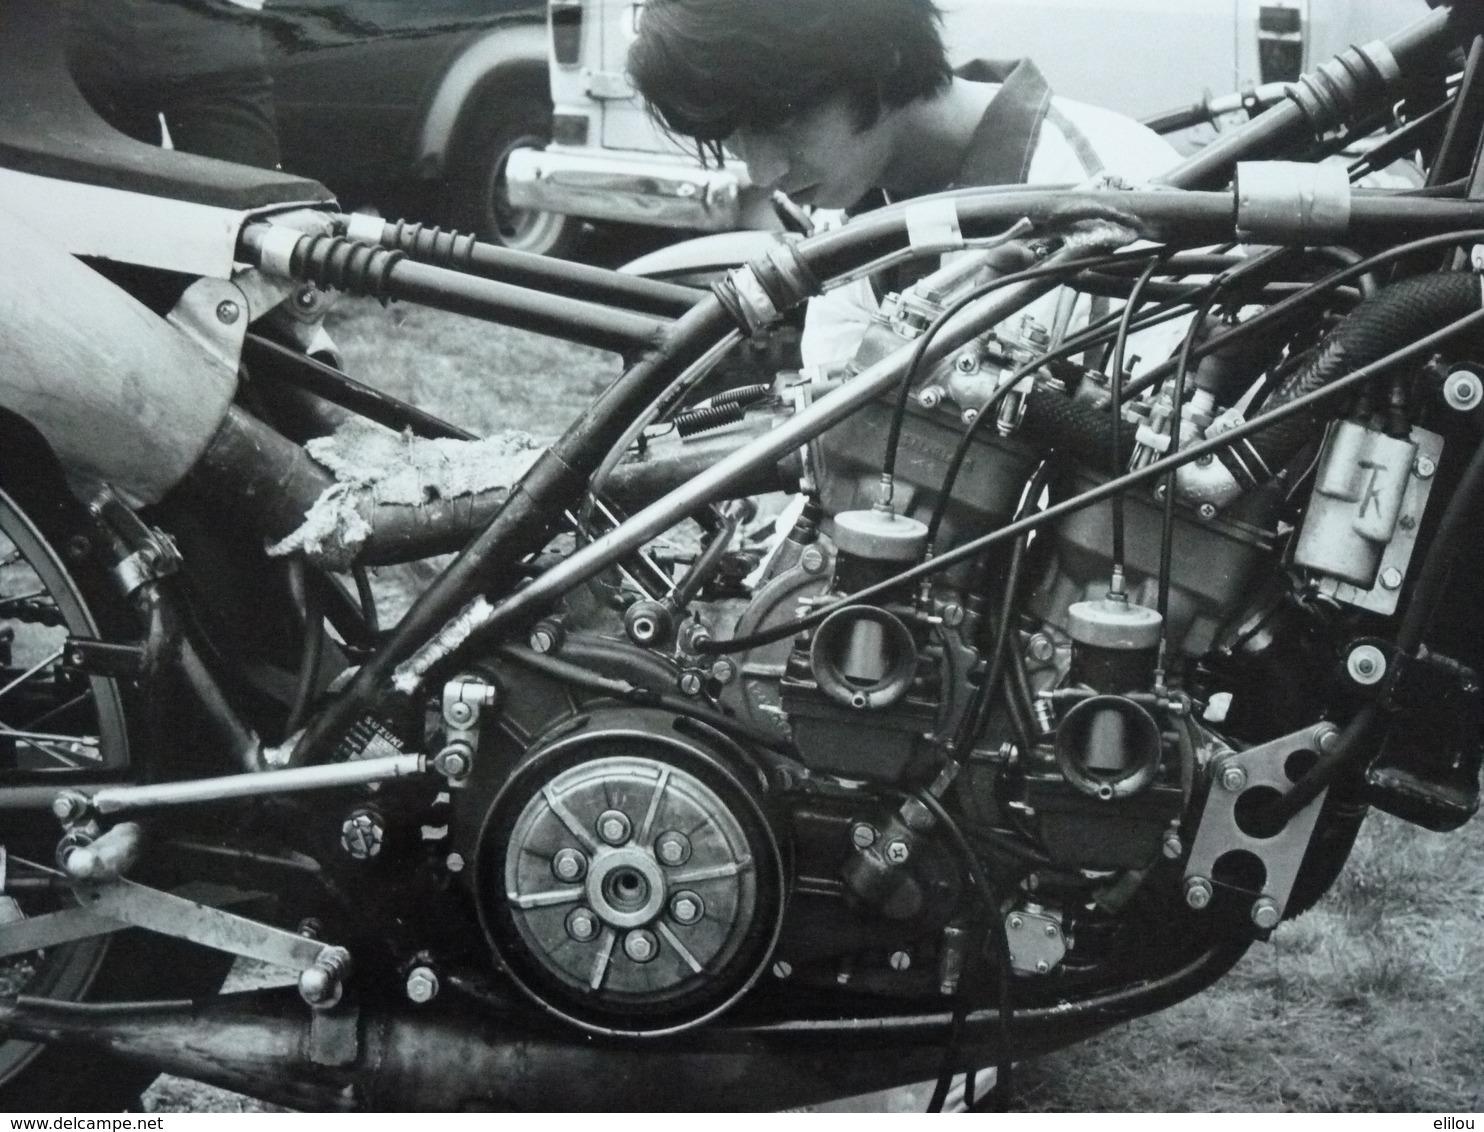 Rare! Belle Photo Ancienne Moto Ancienne Années 70 Tampon Photographe  !!! - Motorbikes